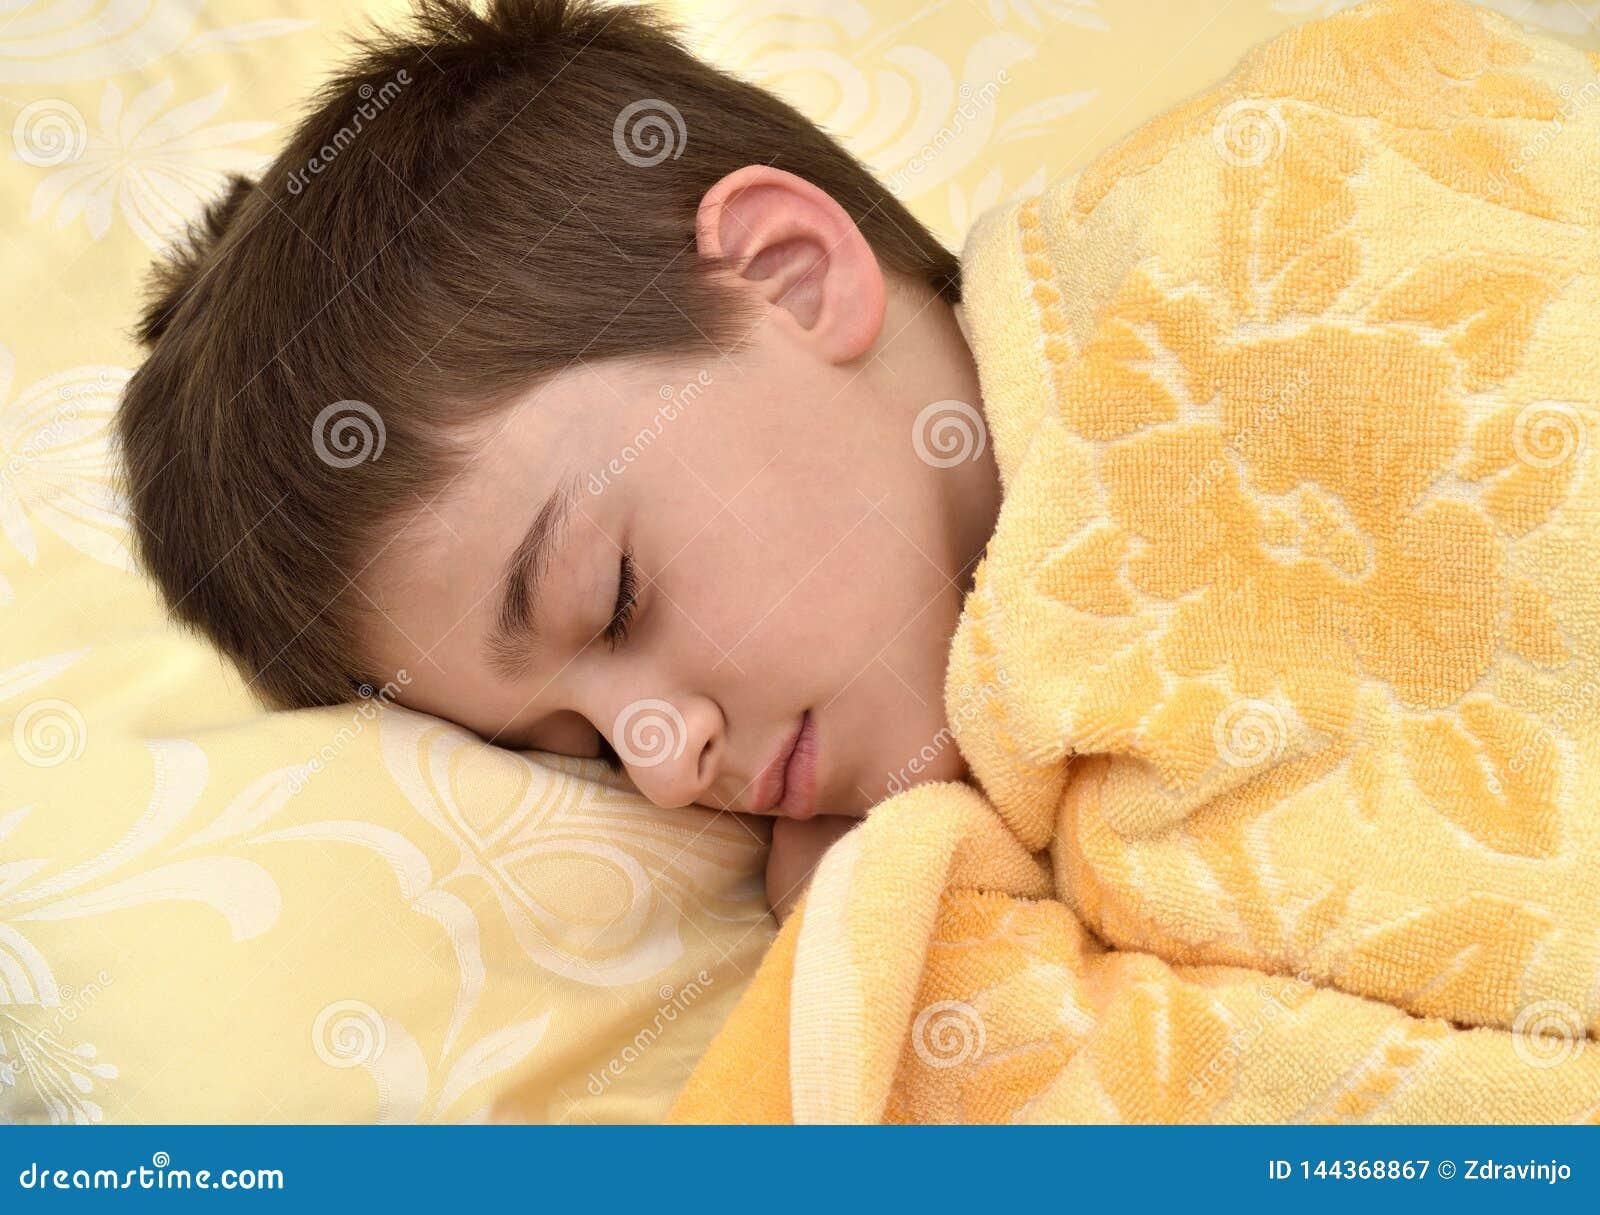 Cute young boy sleeping